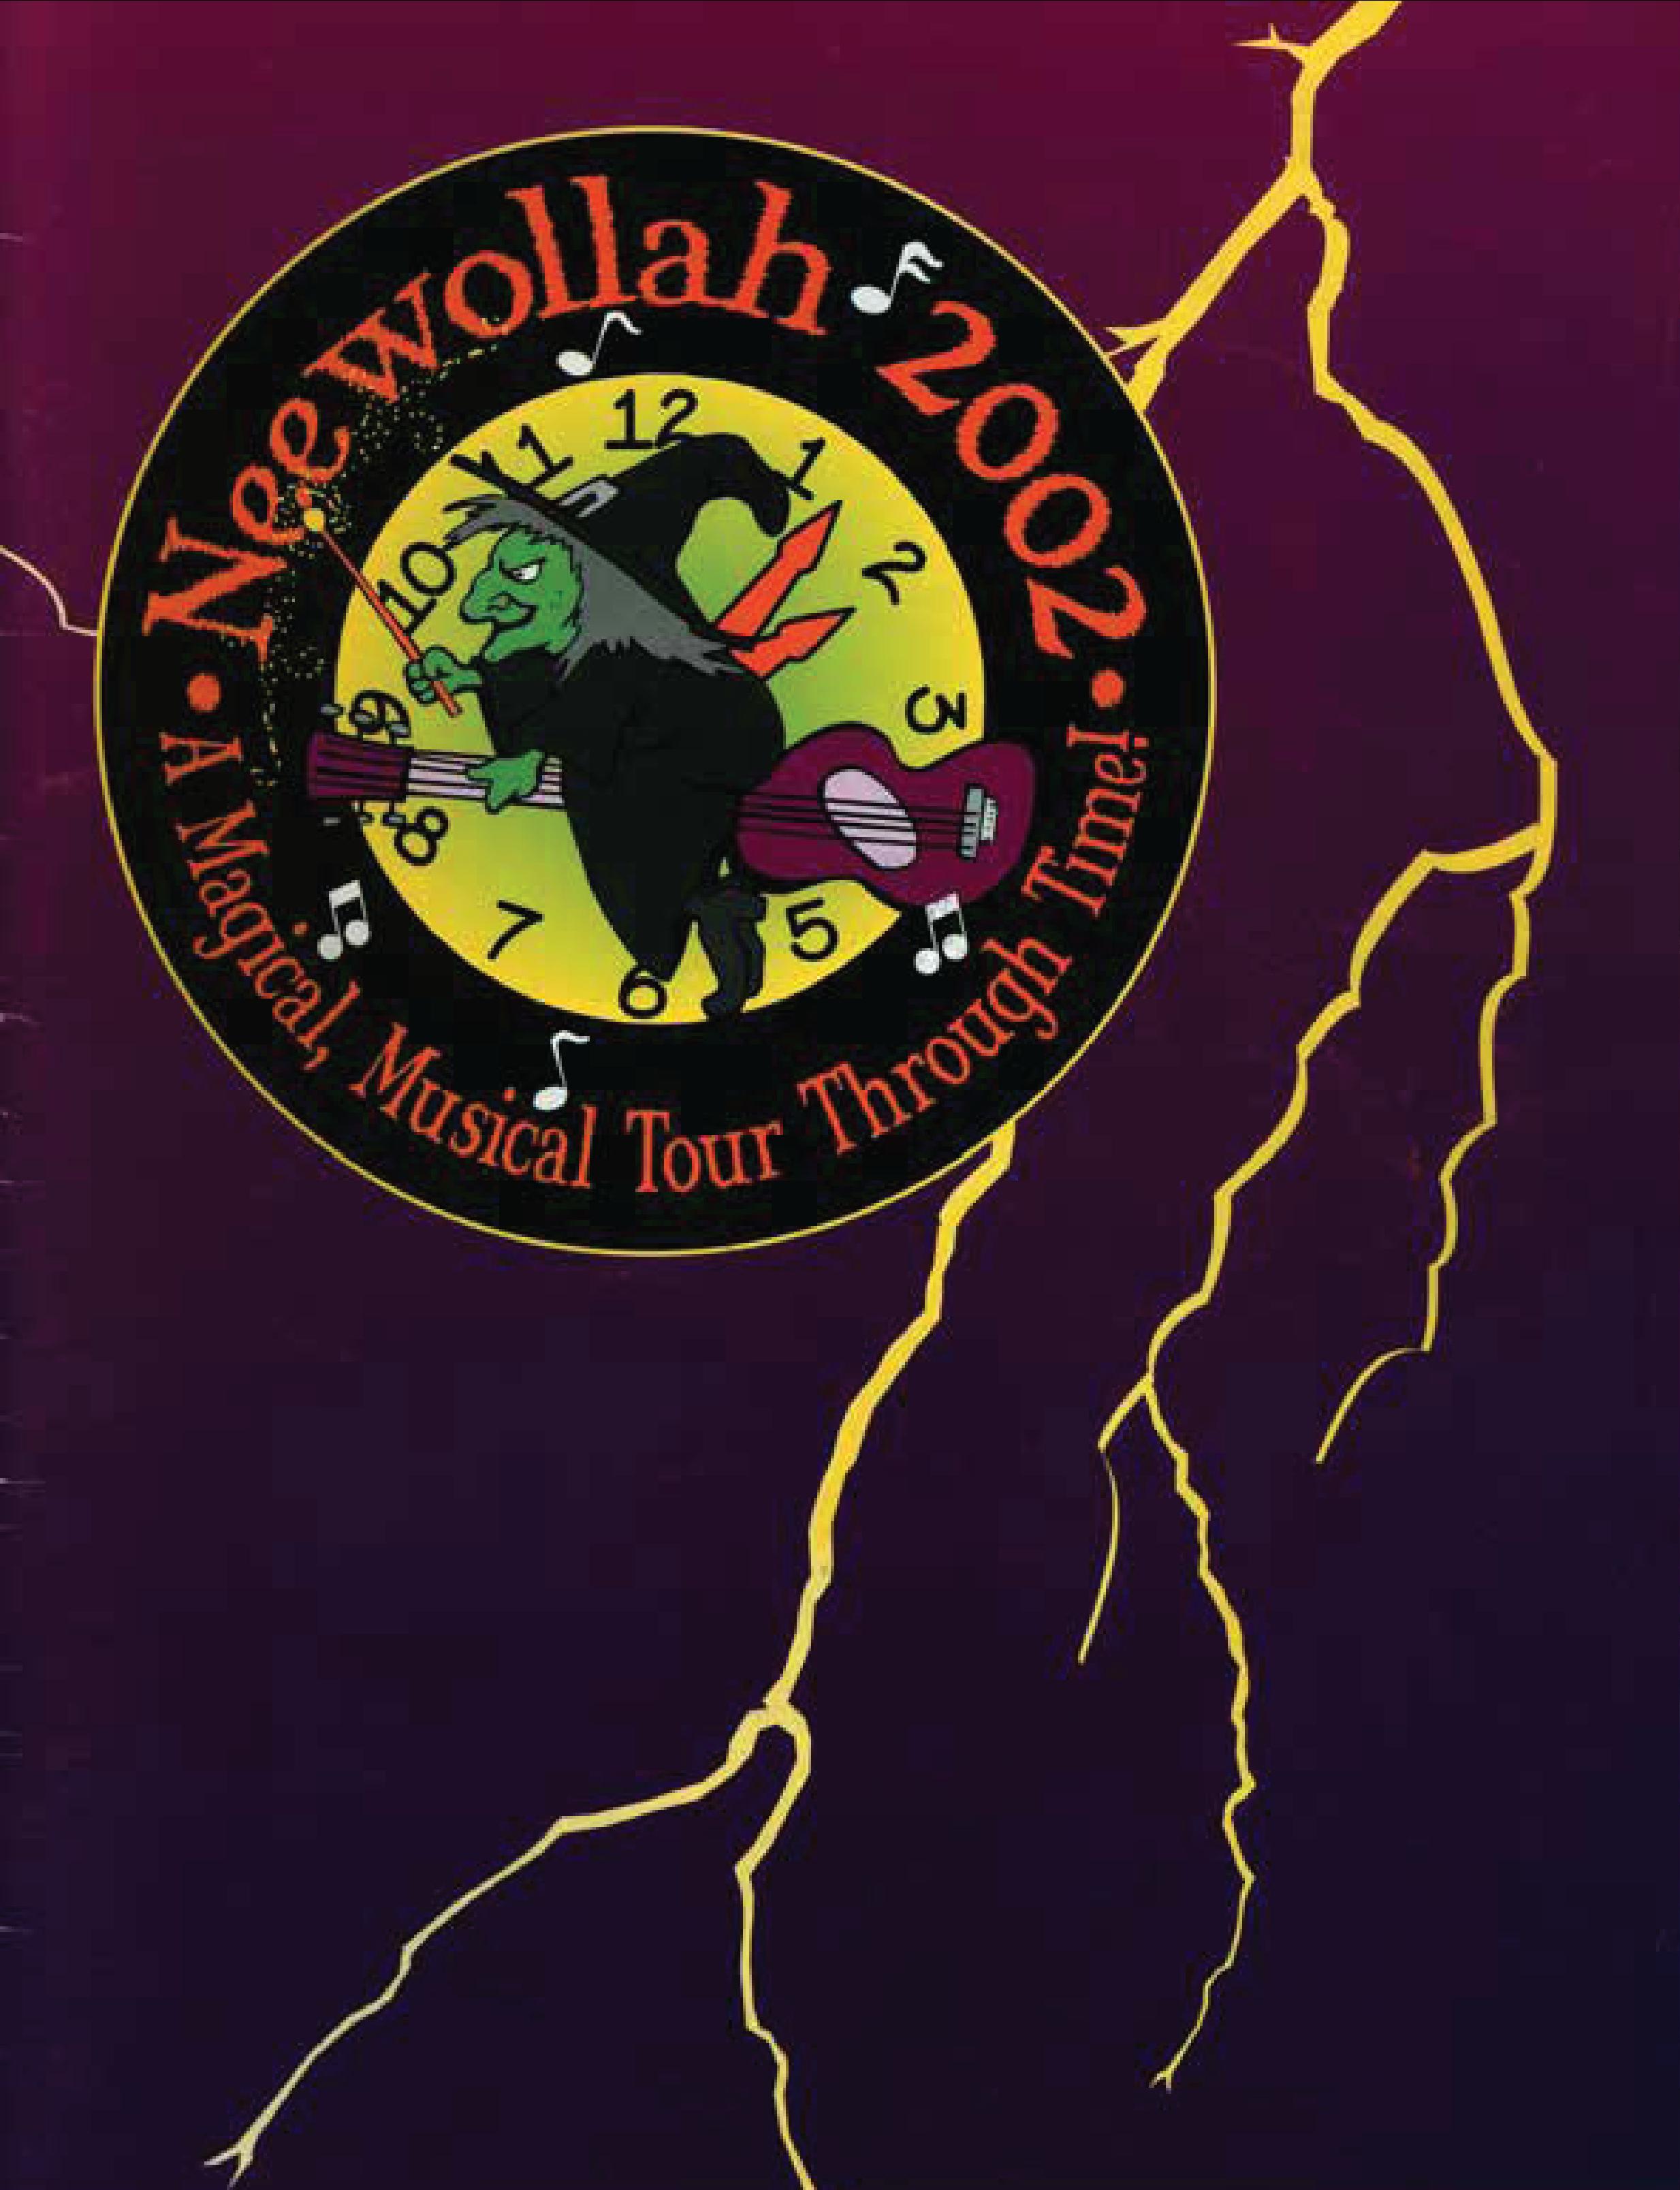 Neewollah 2002 A Magical Musical Tour Through Time